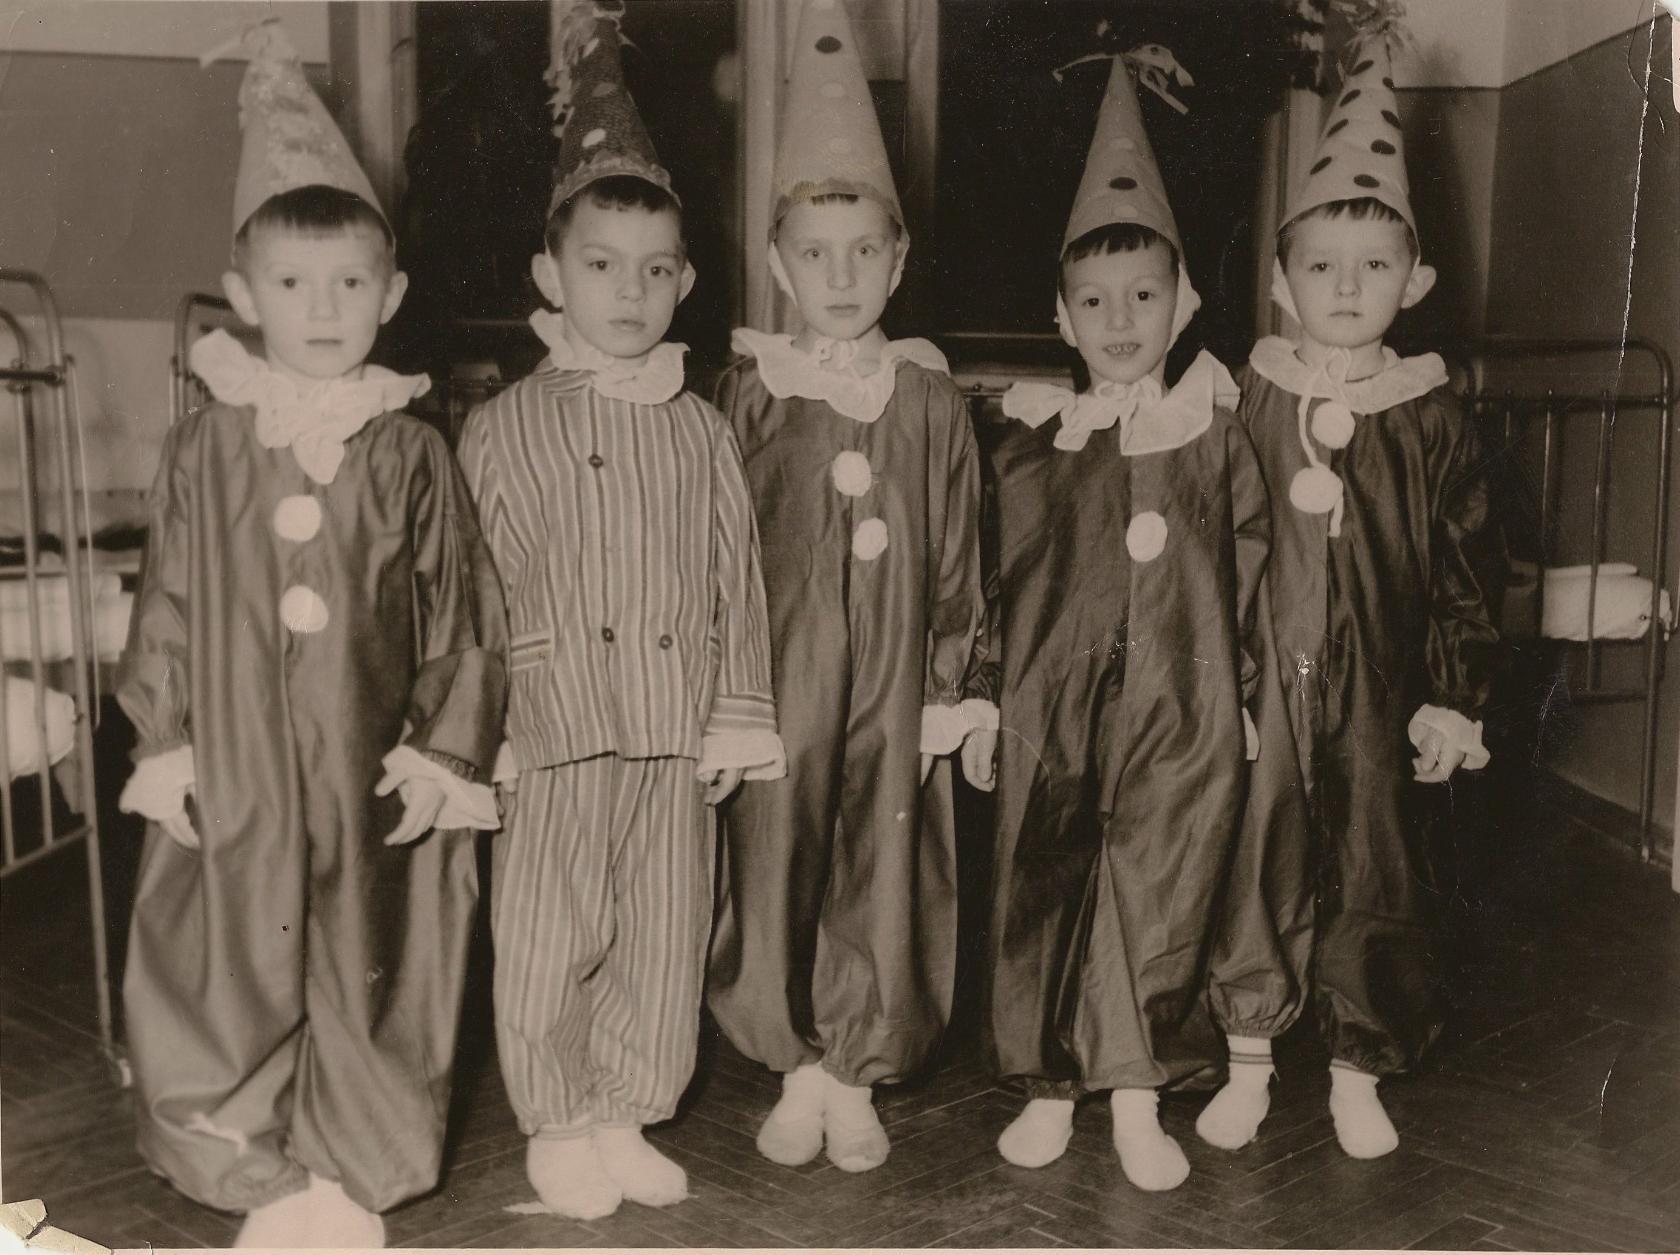 Детский сад на ул. Ленина (Б.Очаковская) 50-60-е годы XX века9